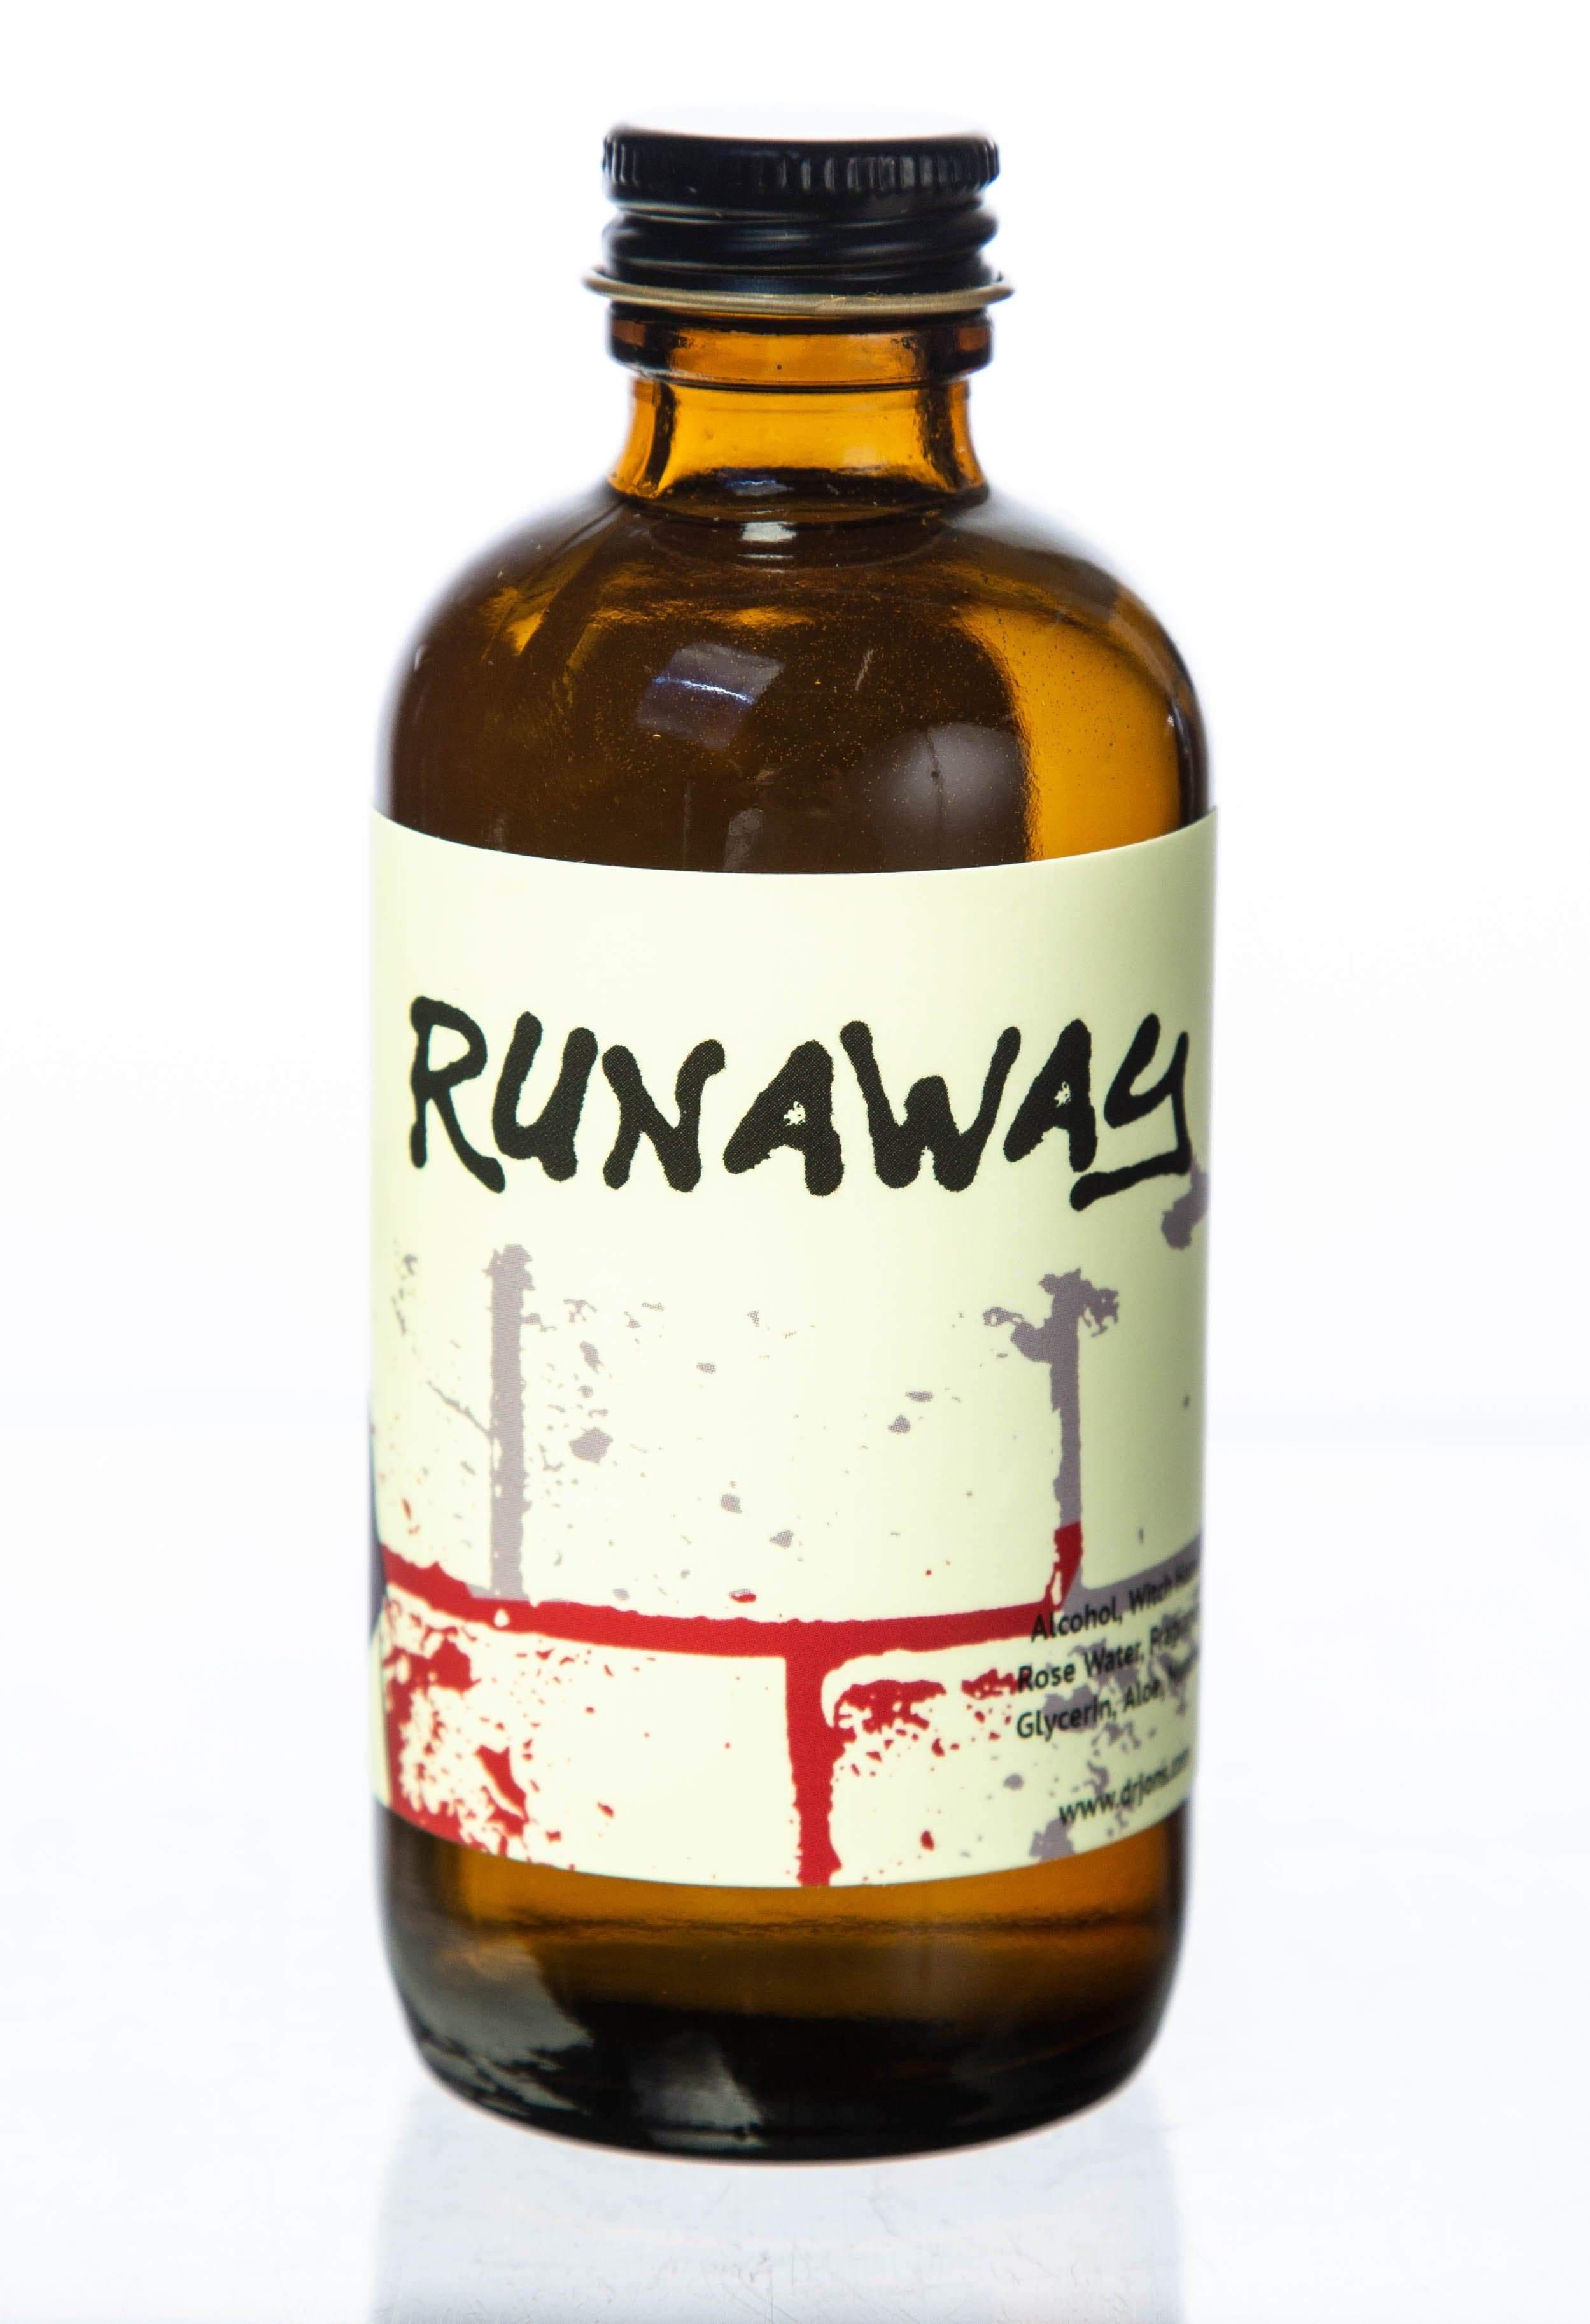 Dr. Jon's - Runaway - Splash image